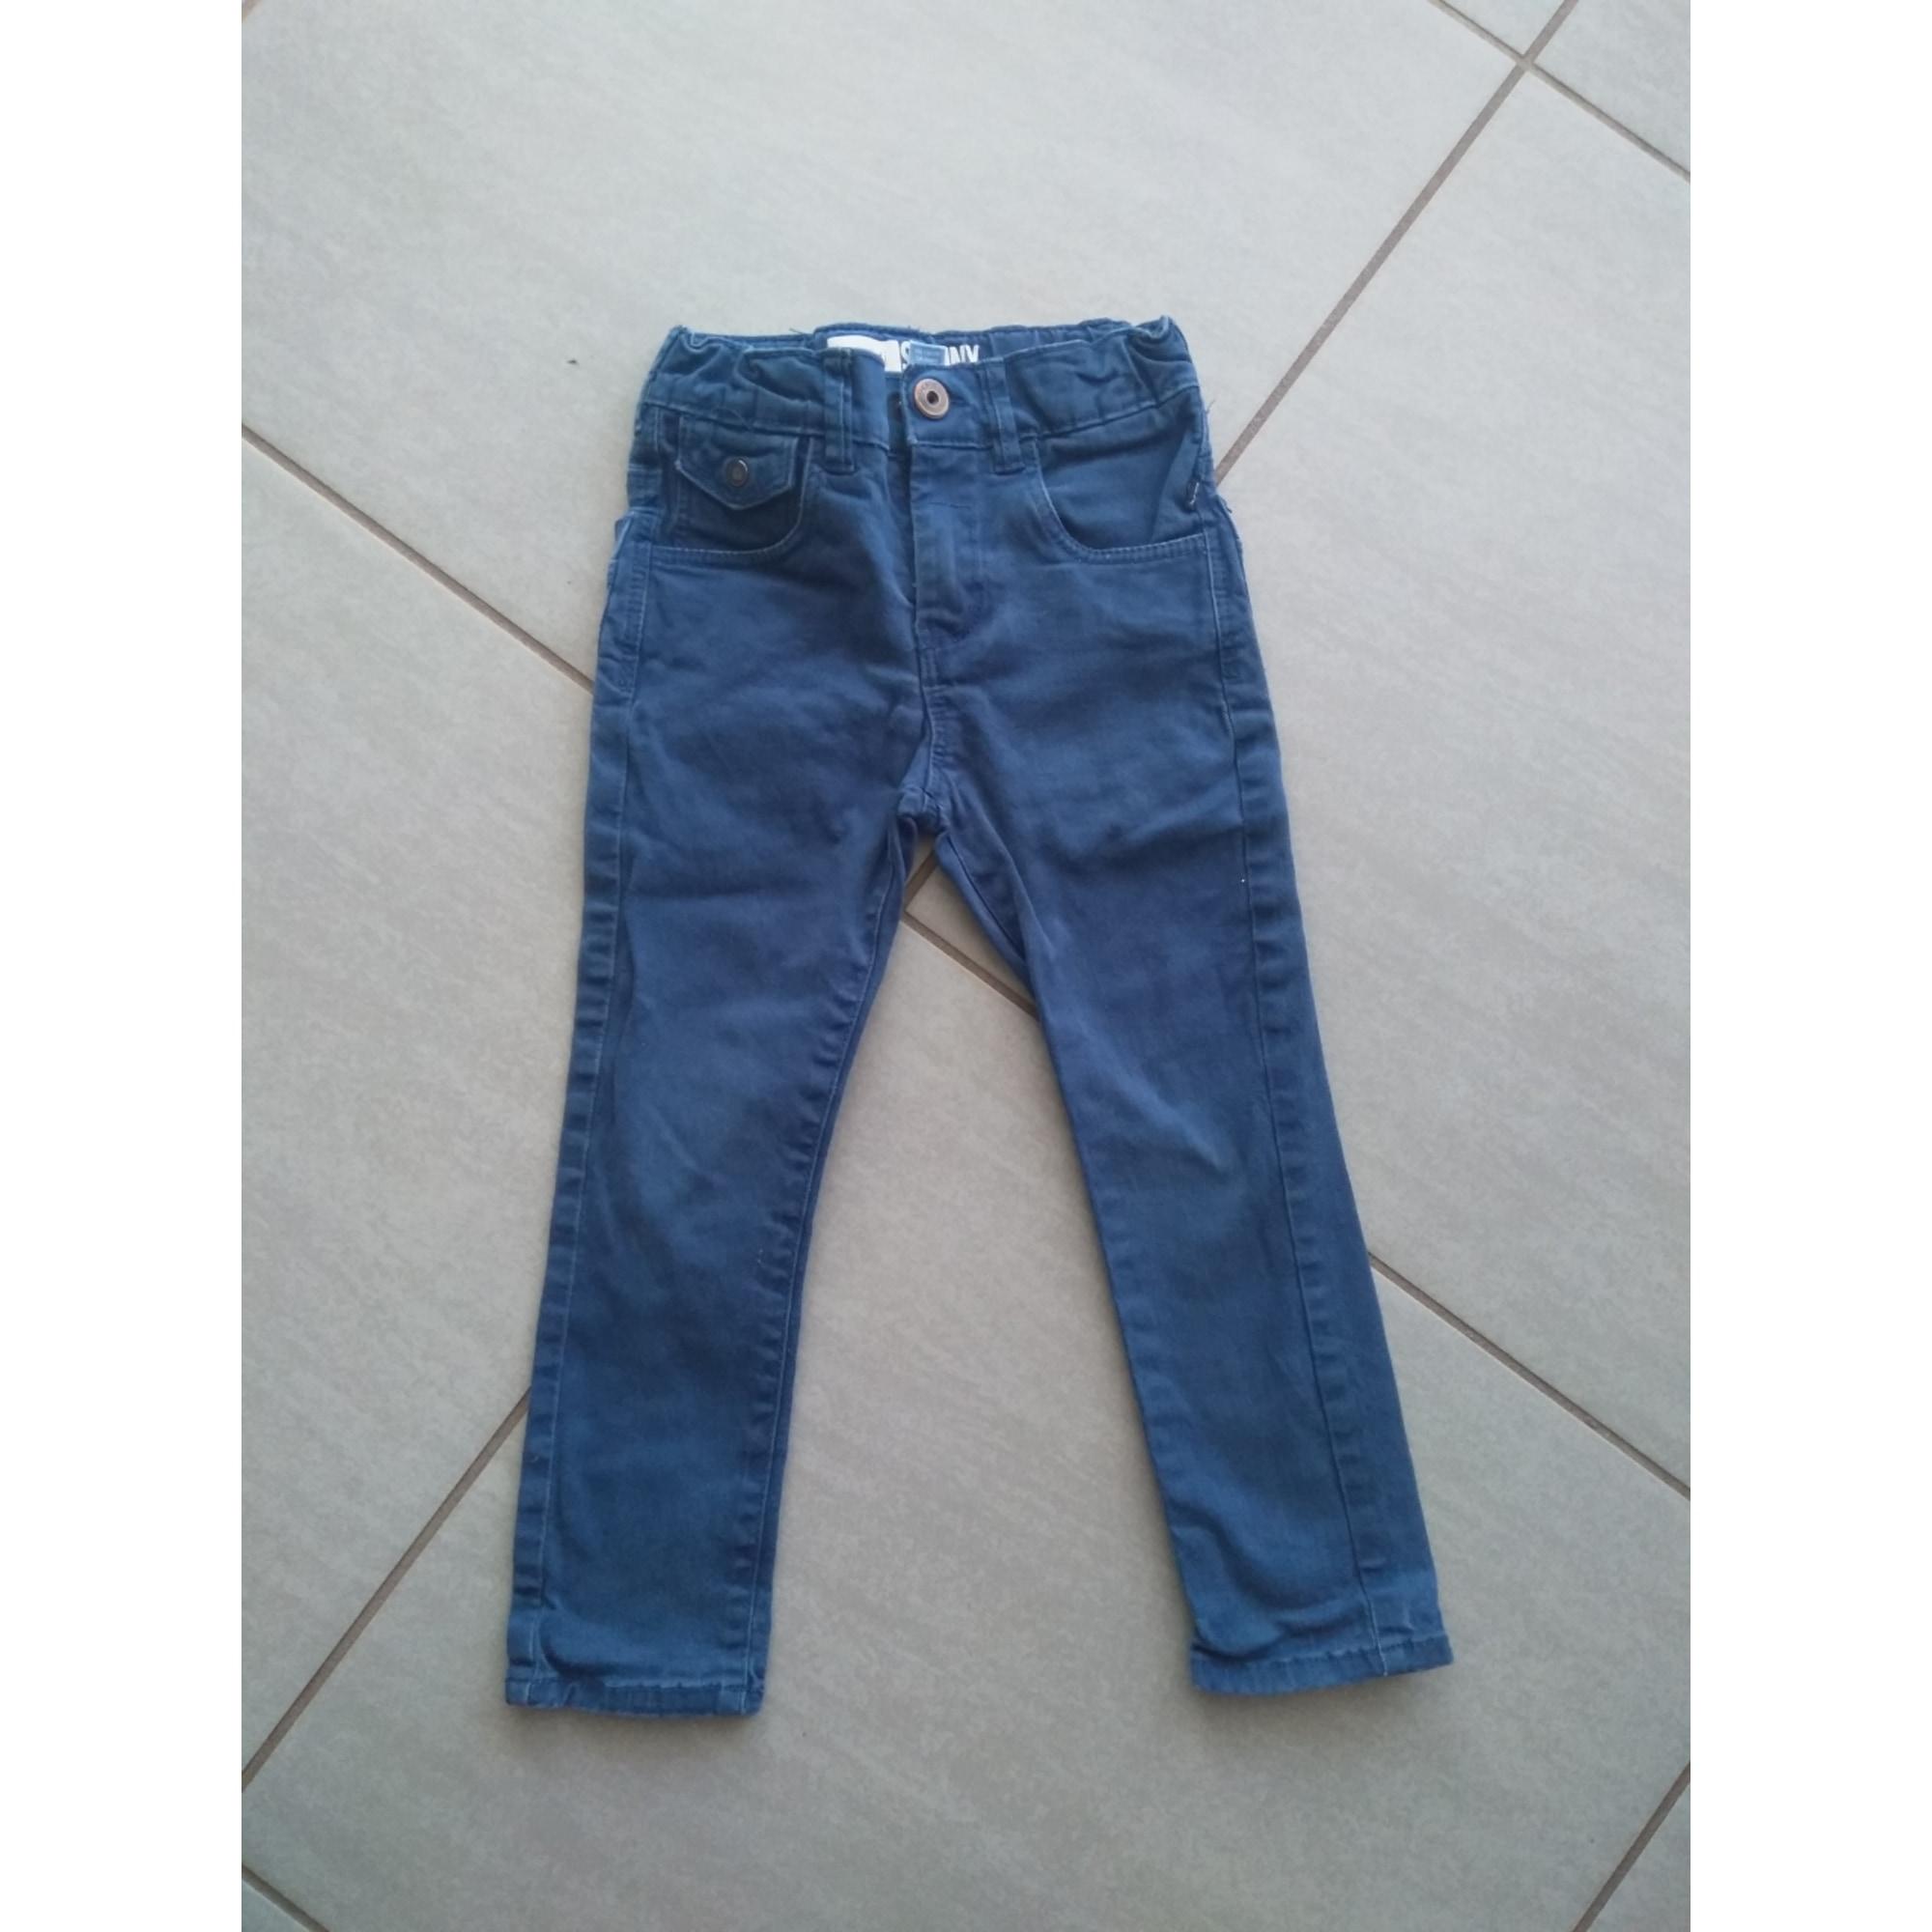 Jean slim OKAÏDI Bleu, bleu marine, bleu turquoise